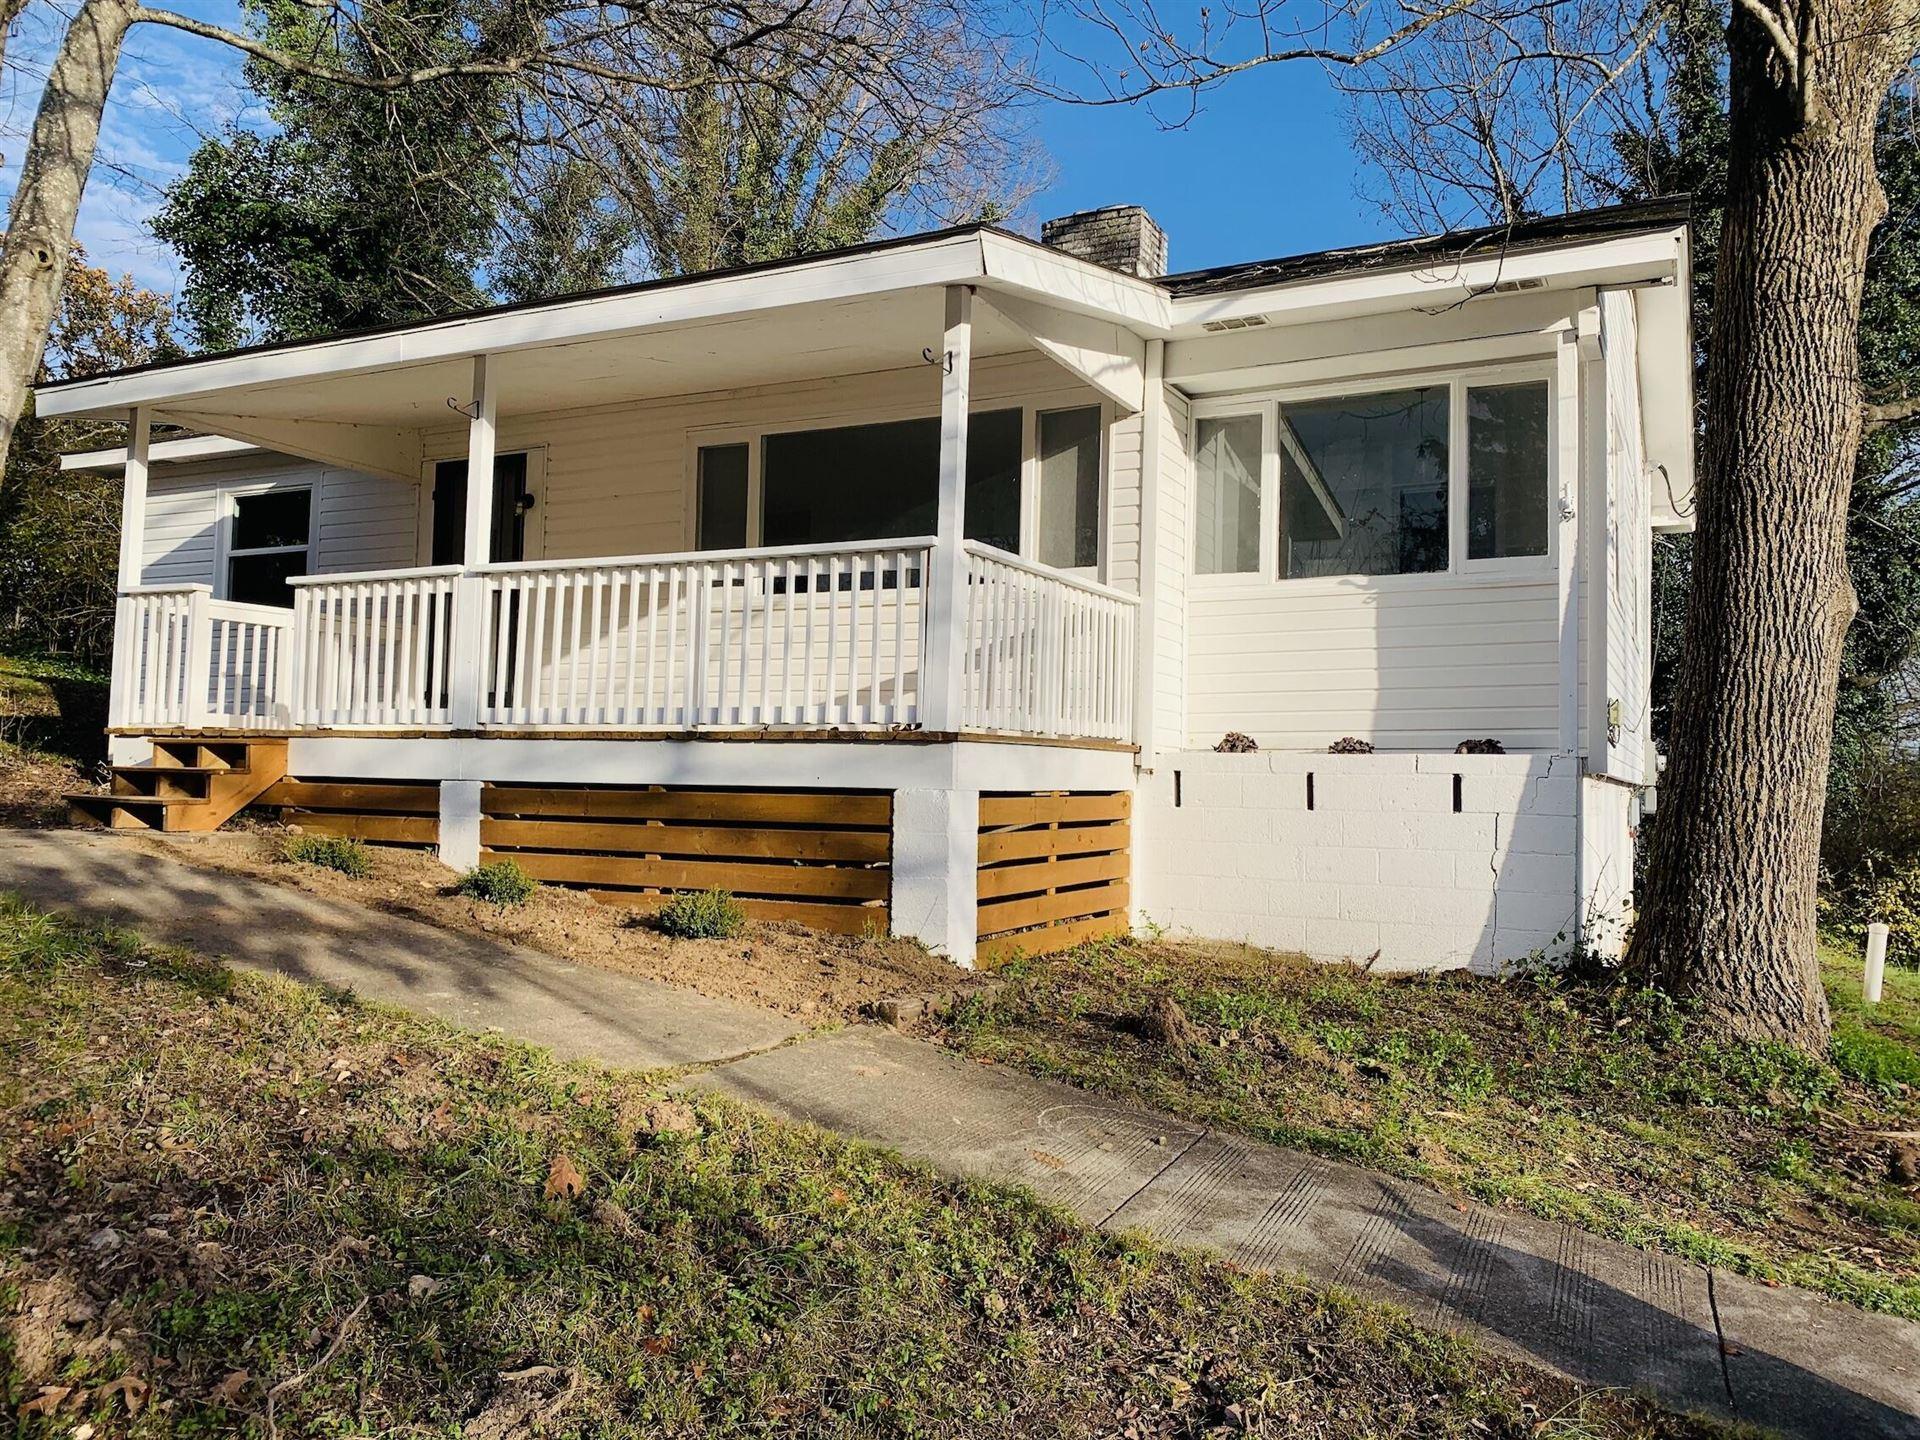 Photo of 606 Florida Ave, Oak Ridge, TN 37830 (MLS # 1164107)